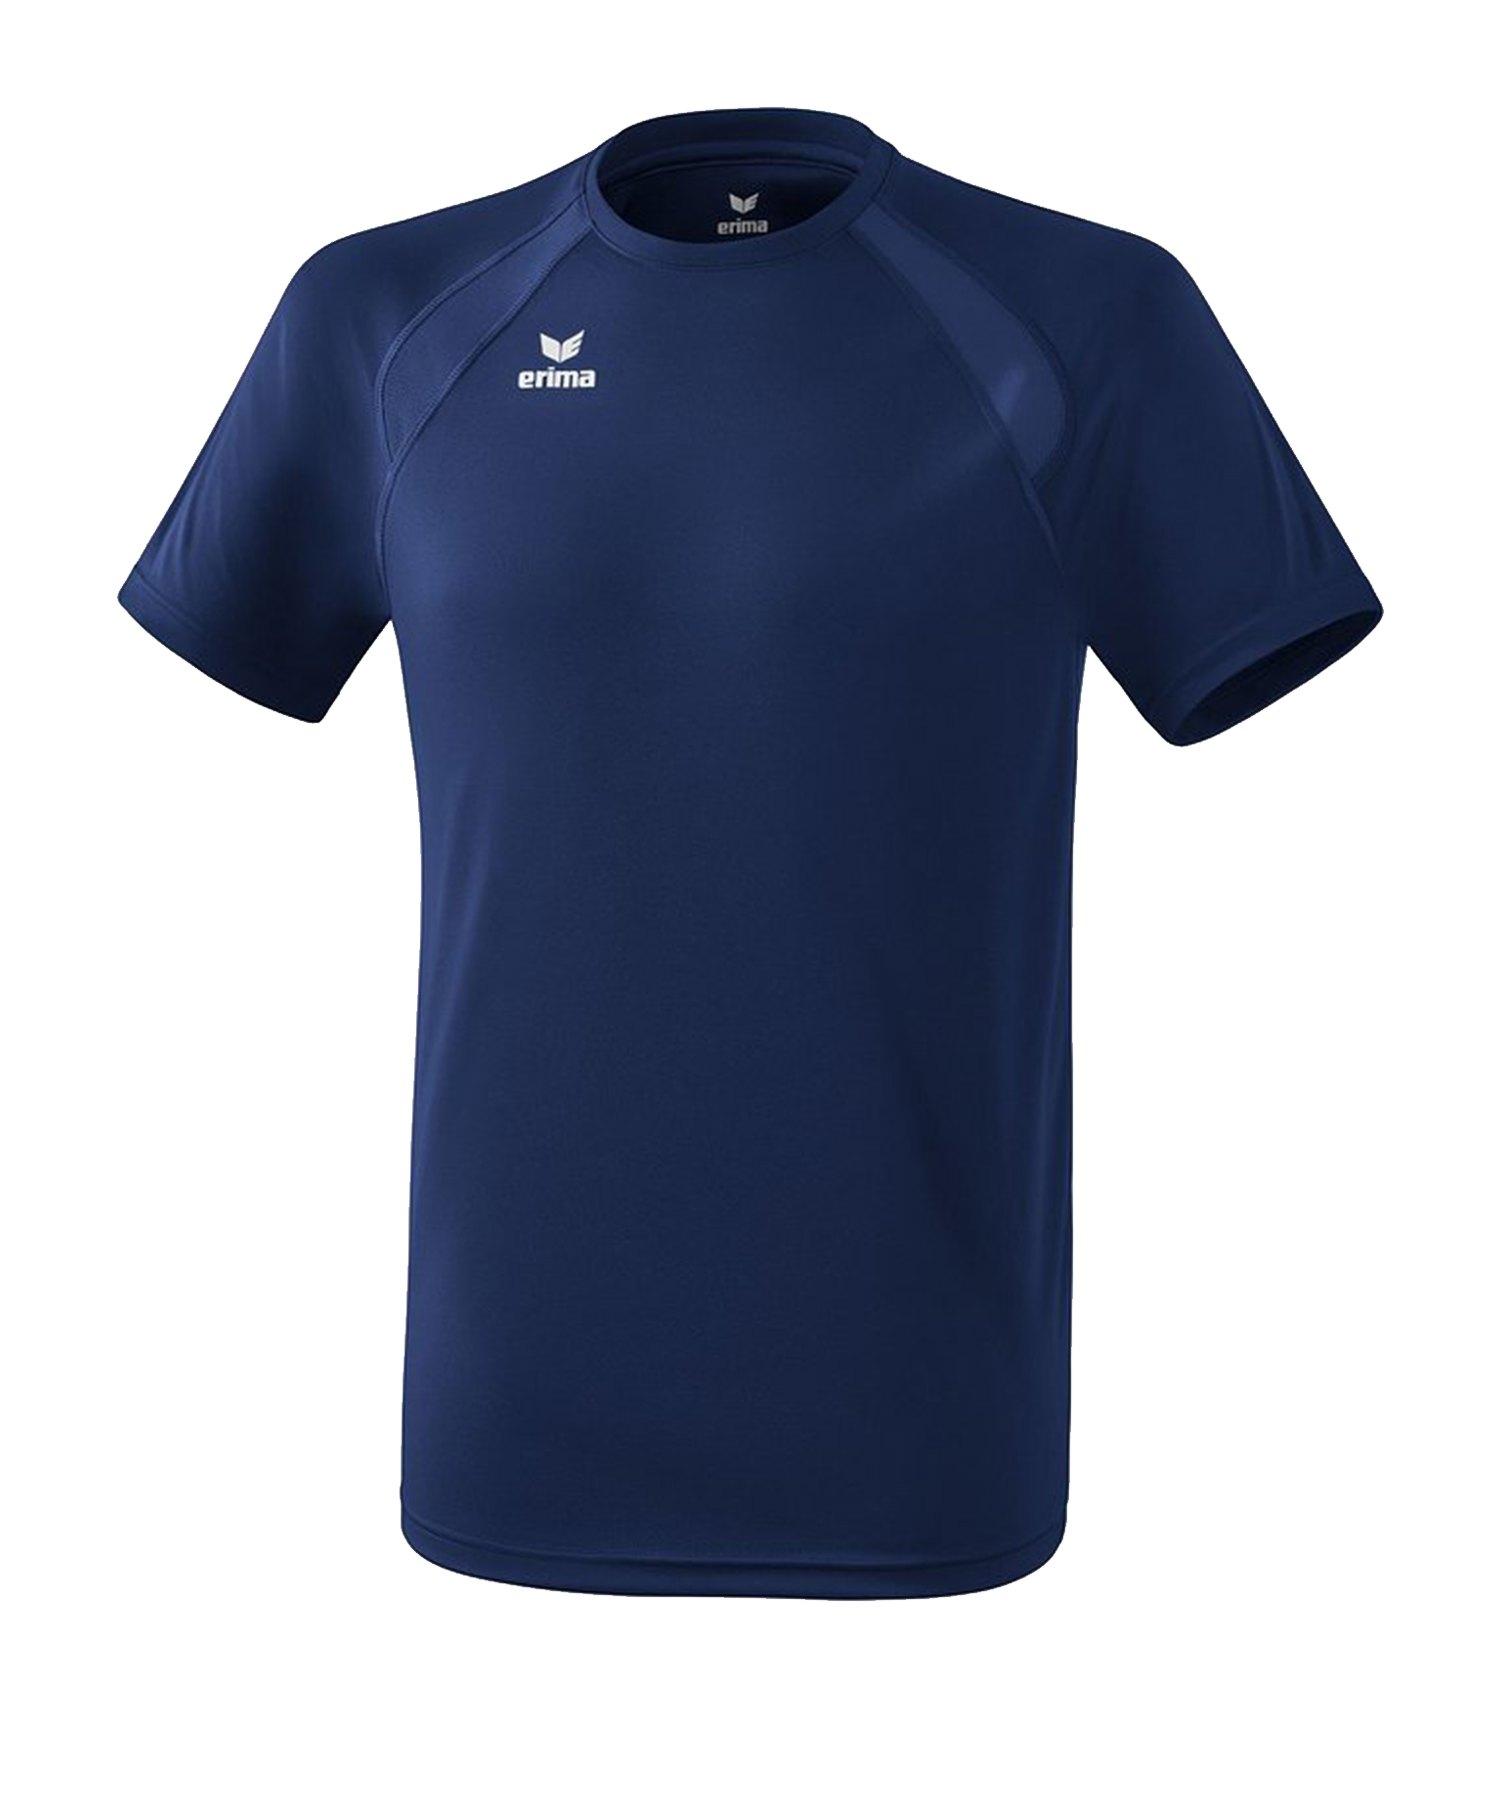 Erima Performance T-Shirt Blau - Blau